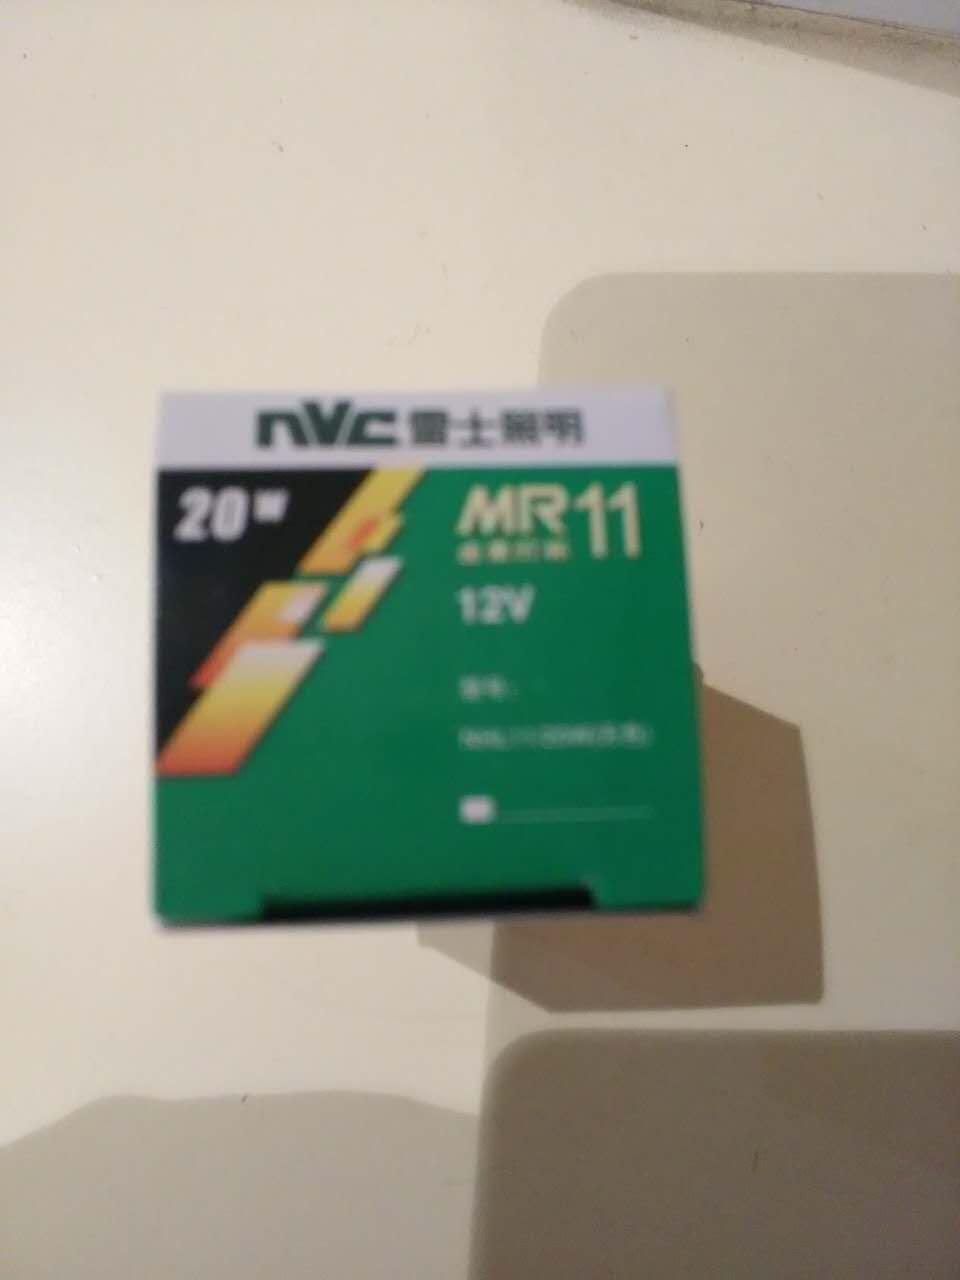 free 4.0 running 00975258 cheaponsale